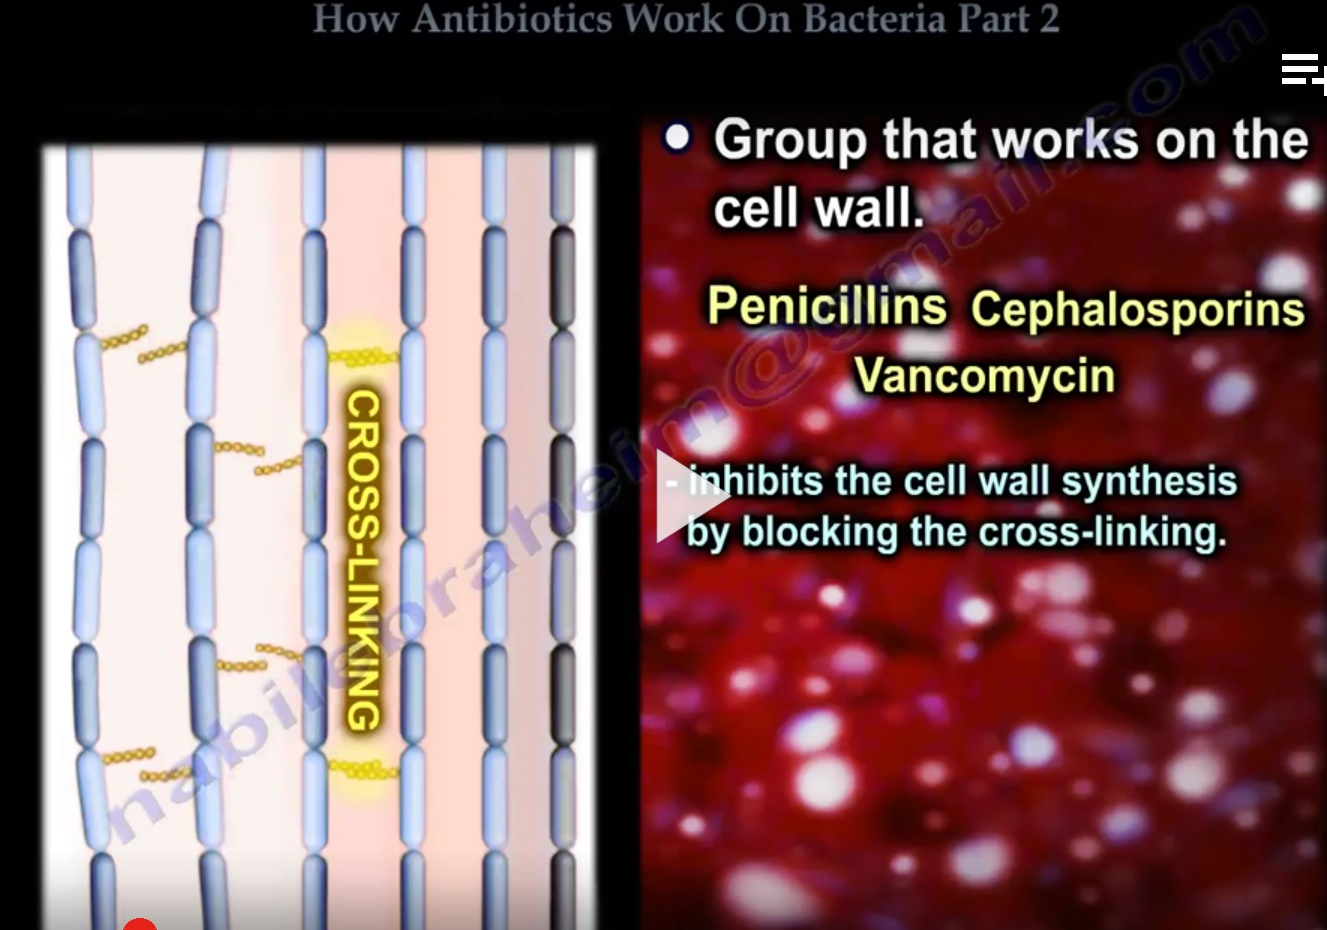 antibiotcics part2